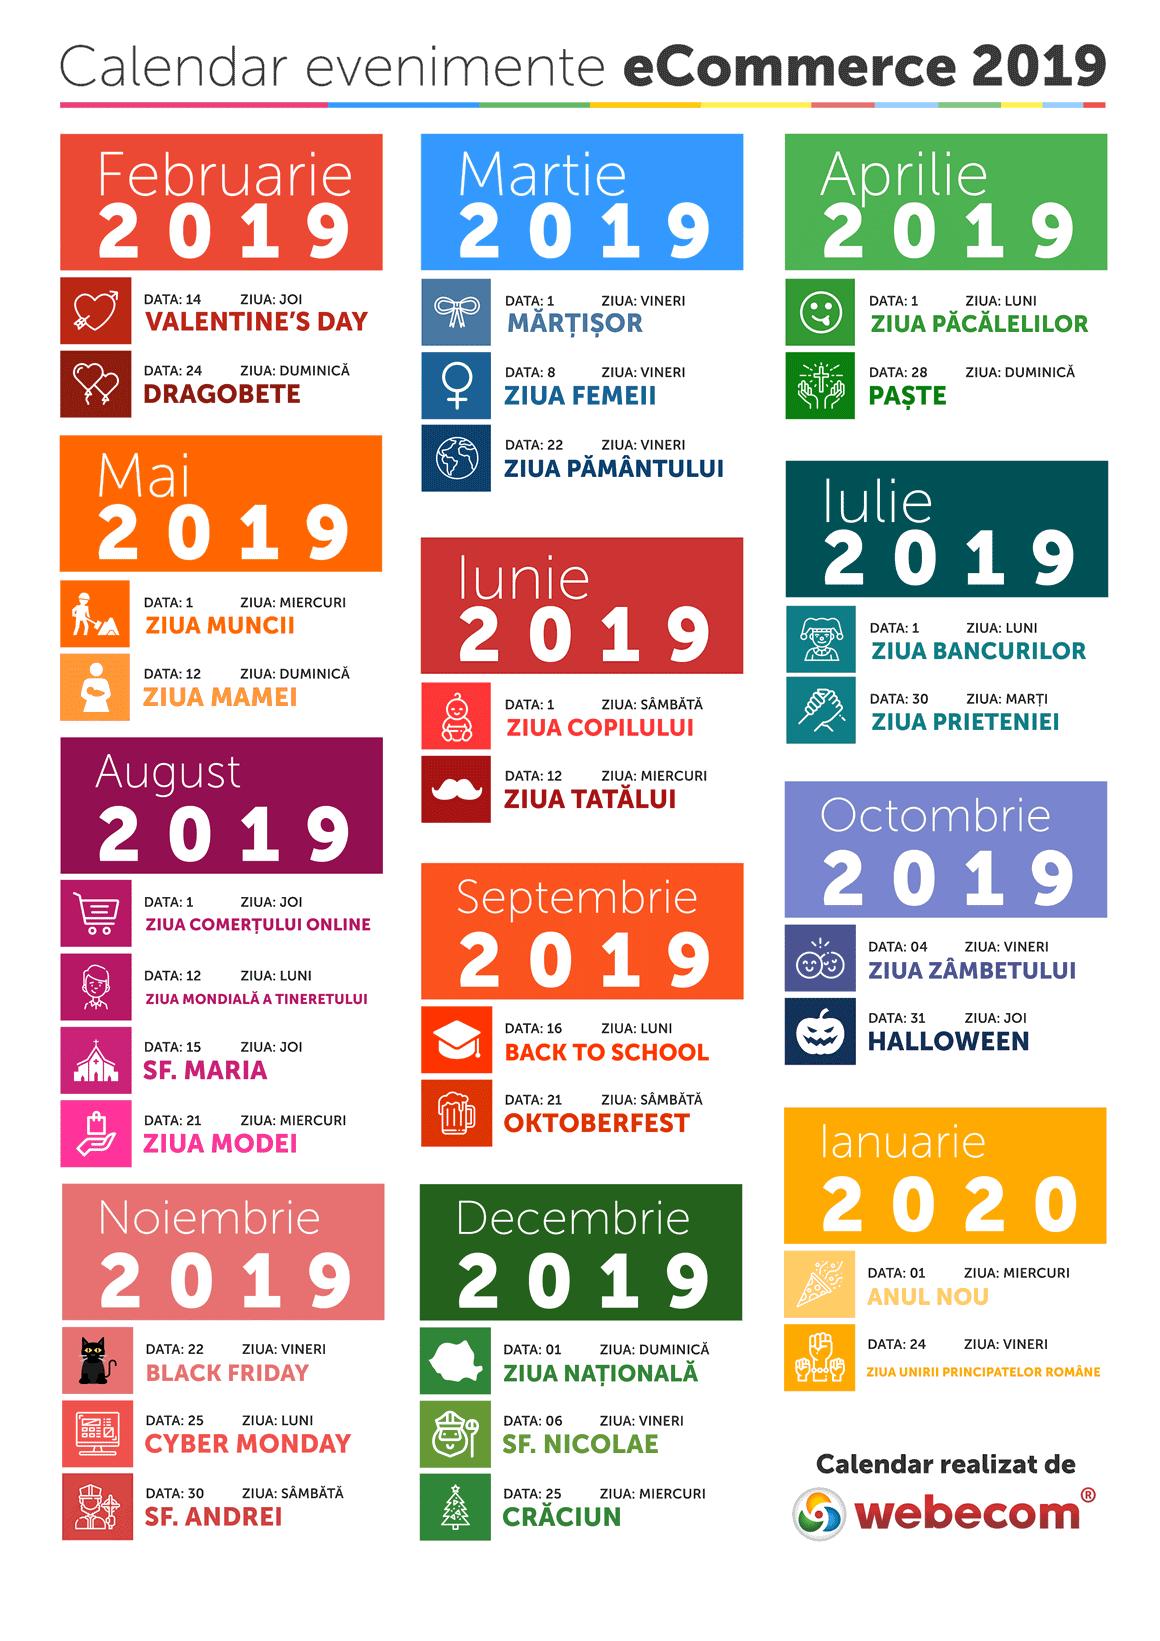 calendar-ecommerce-2019